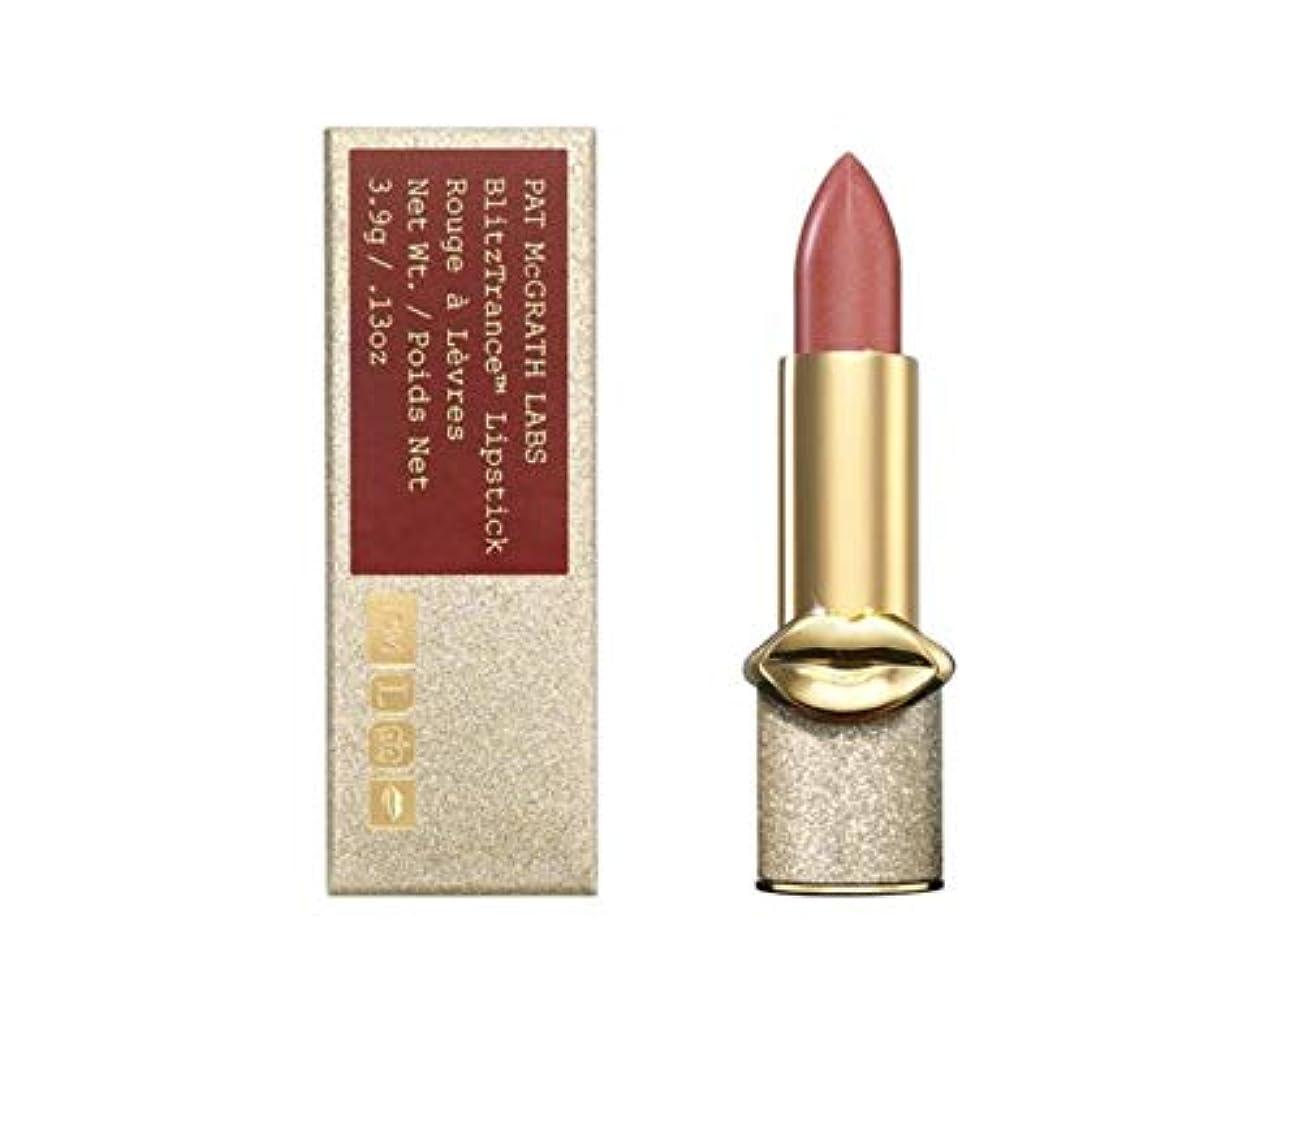 PAT MCGRATH LABS BlitzTrance™ Lipstick (Skin Flixx)